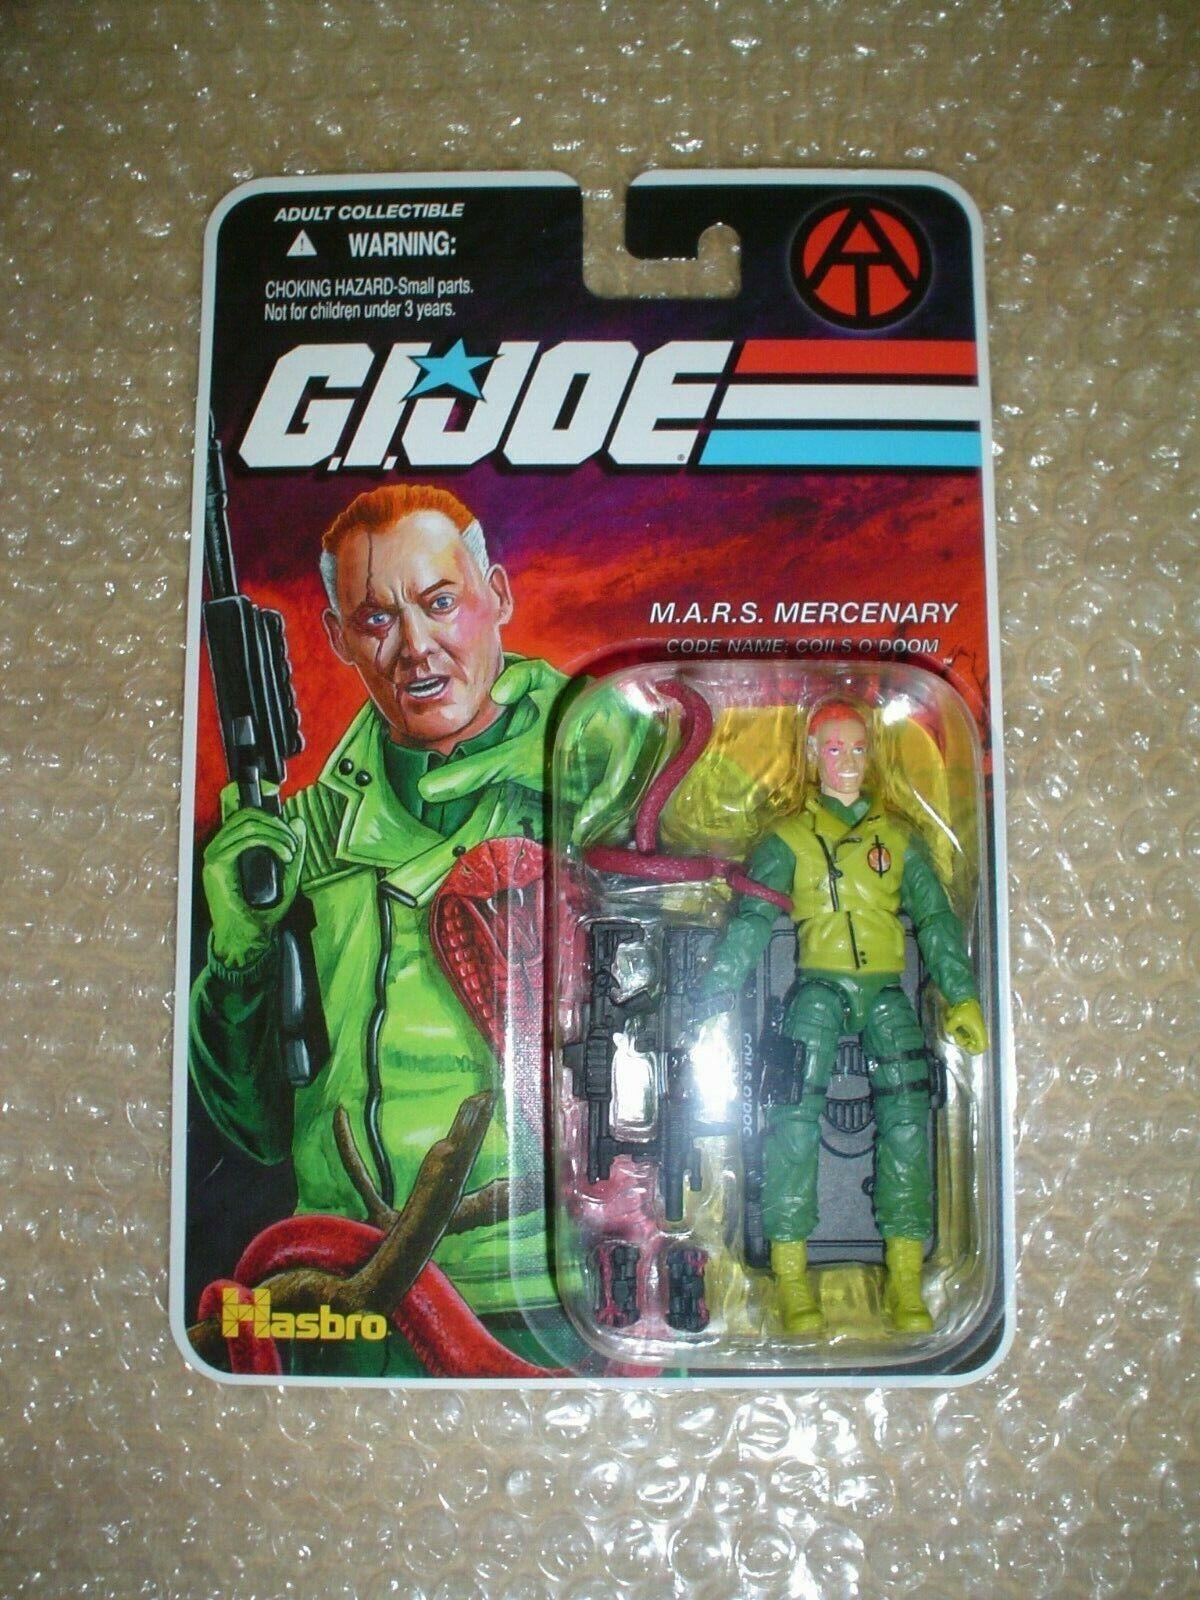 G.I. Joe exclusivo club FSS la final 12  las bobinas de Doom-M.A.R.S. mercenario